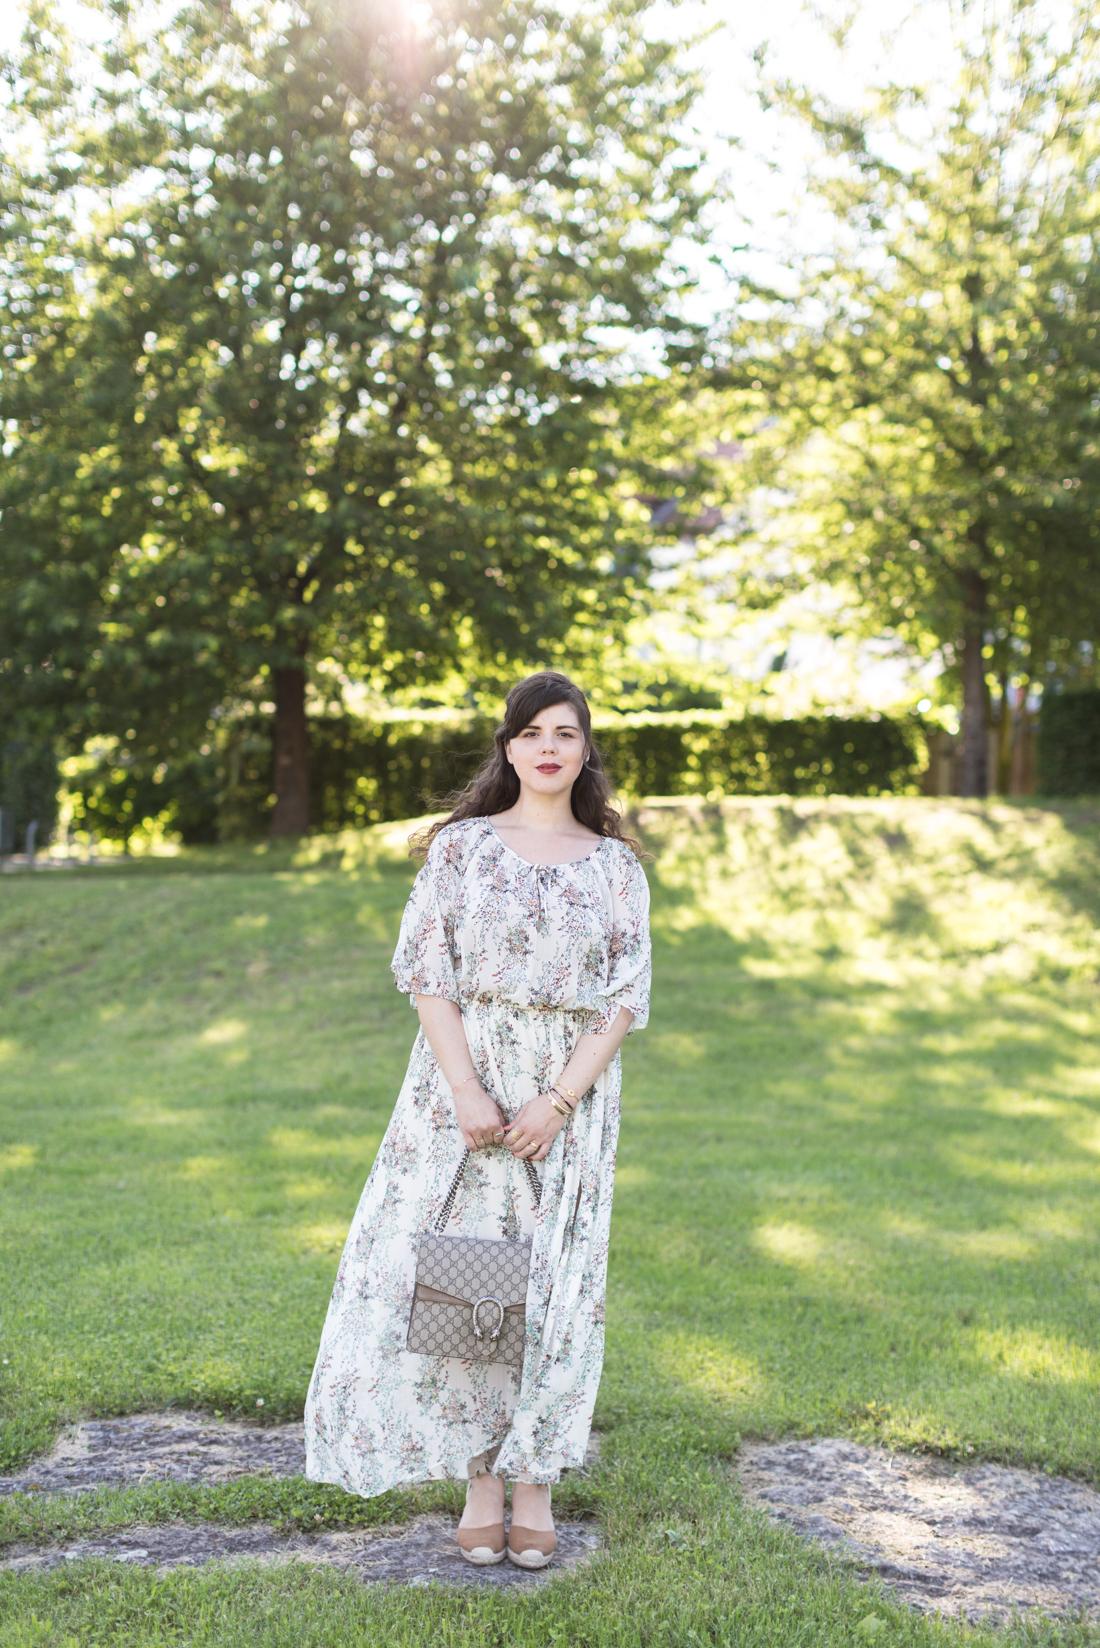 1100 robe ikks sac gucci dionysus espadrilles sezane - copyright Pauline paulinefashionblog.com-4